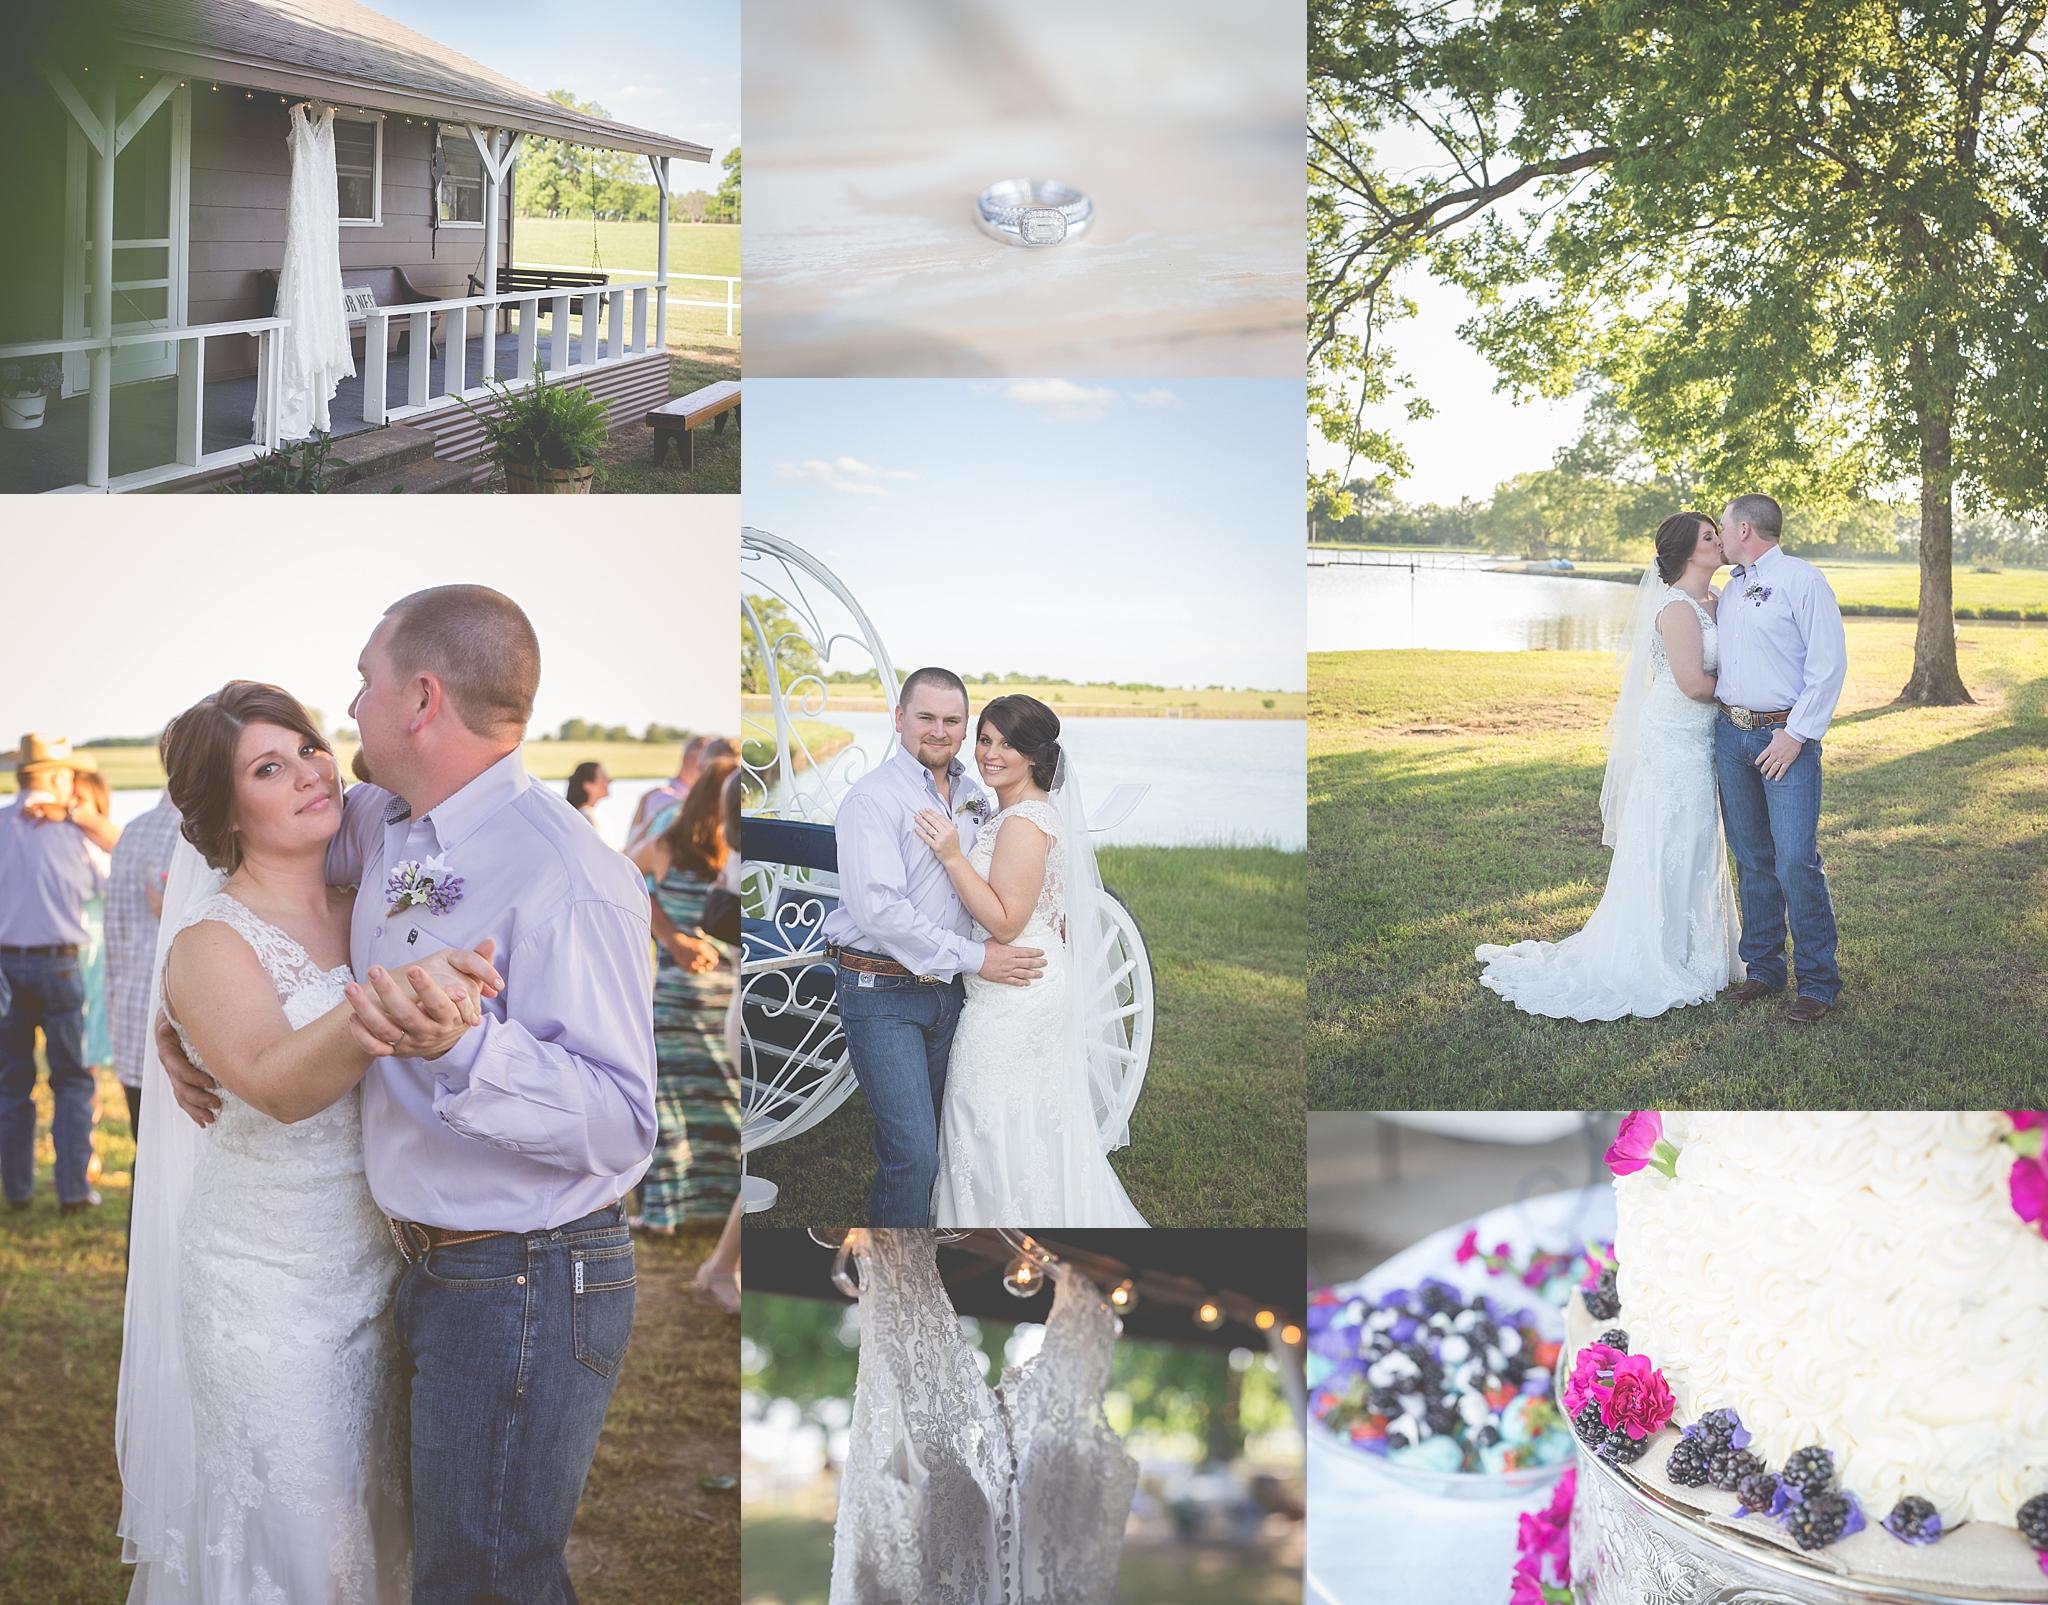 engagement-photos-love-wedding-como-columbia-missouri-jefferson-city-lake-ozark-springfield-wedding-outdoor-couple.jpg